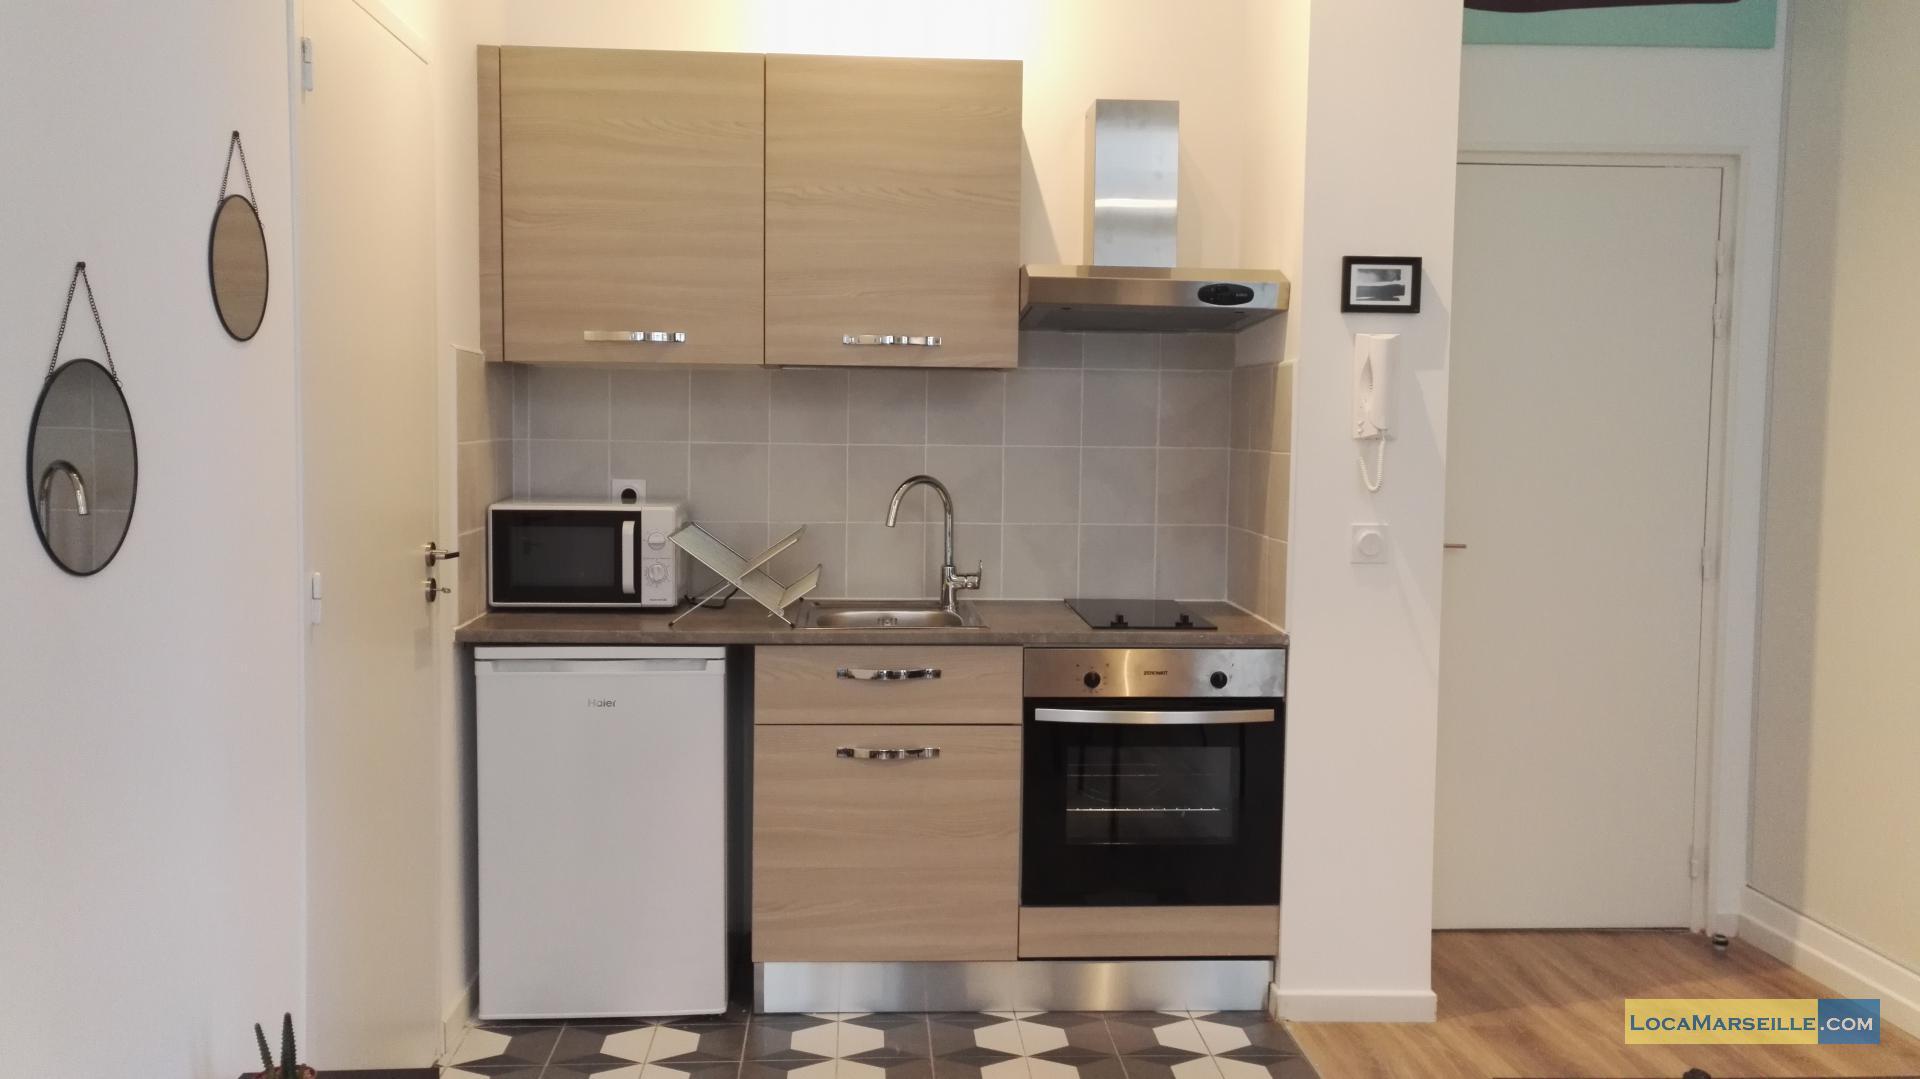 marseille apartment for rent